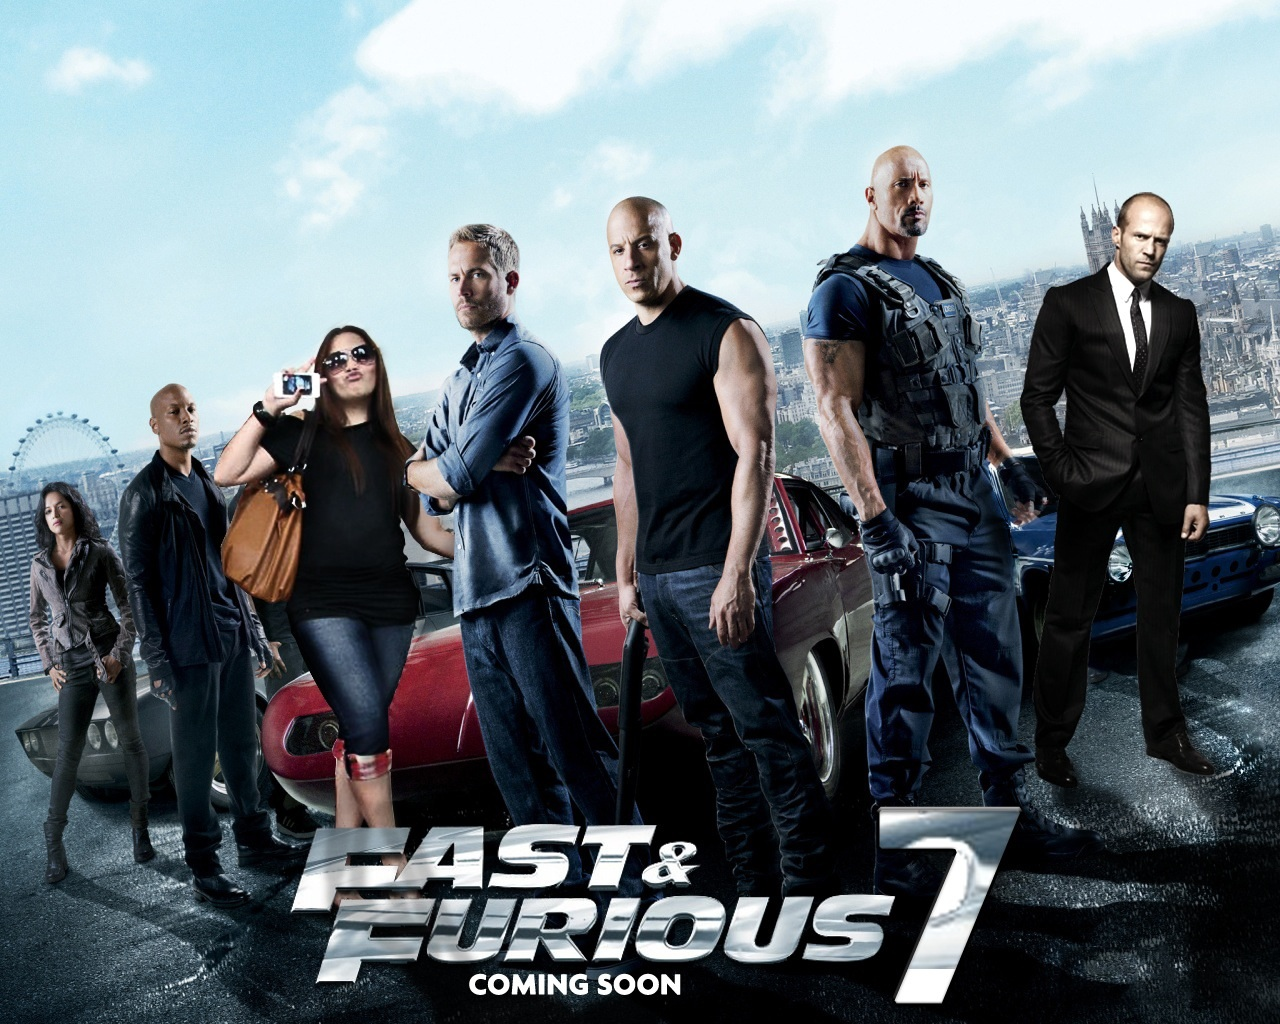 Fast-Furious-7-9667